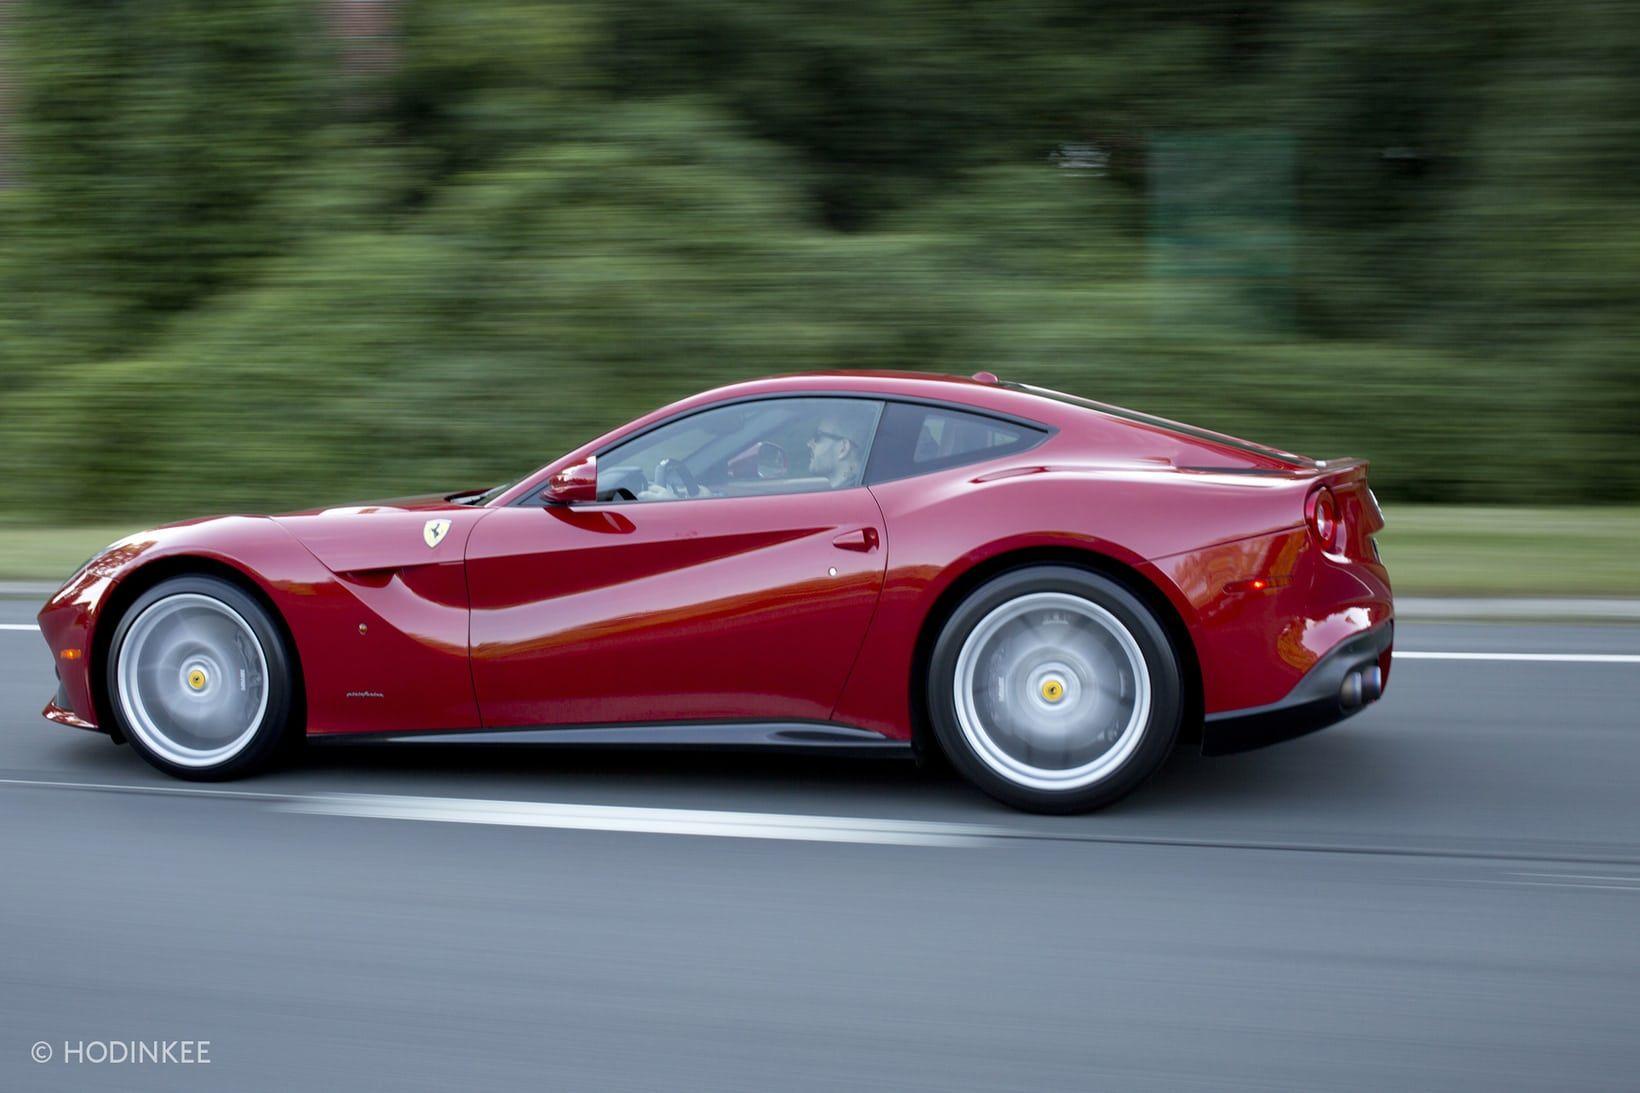 Weekend Report Seventy Two Hours With The 6 3 Liter V12 731 Horsepower 2015 Ferrari F12 Berlinetta Tons Of Photos Hodinkee In 2020 Ferrari F12 Ferrari Seventies